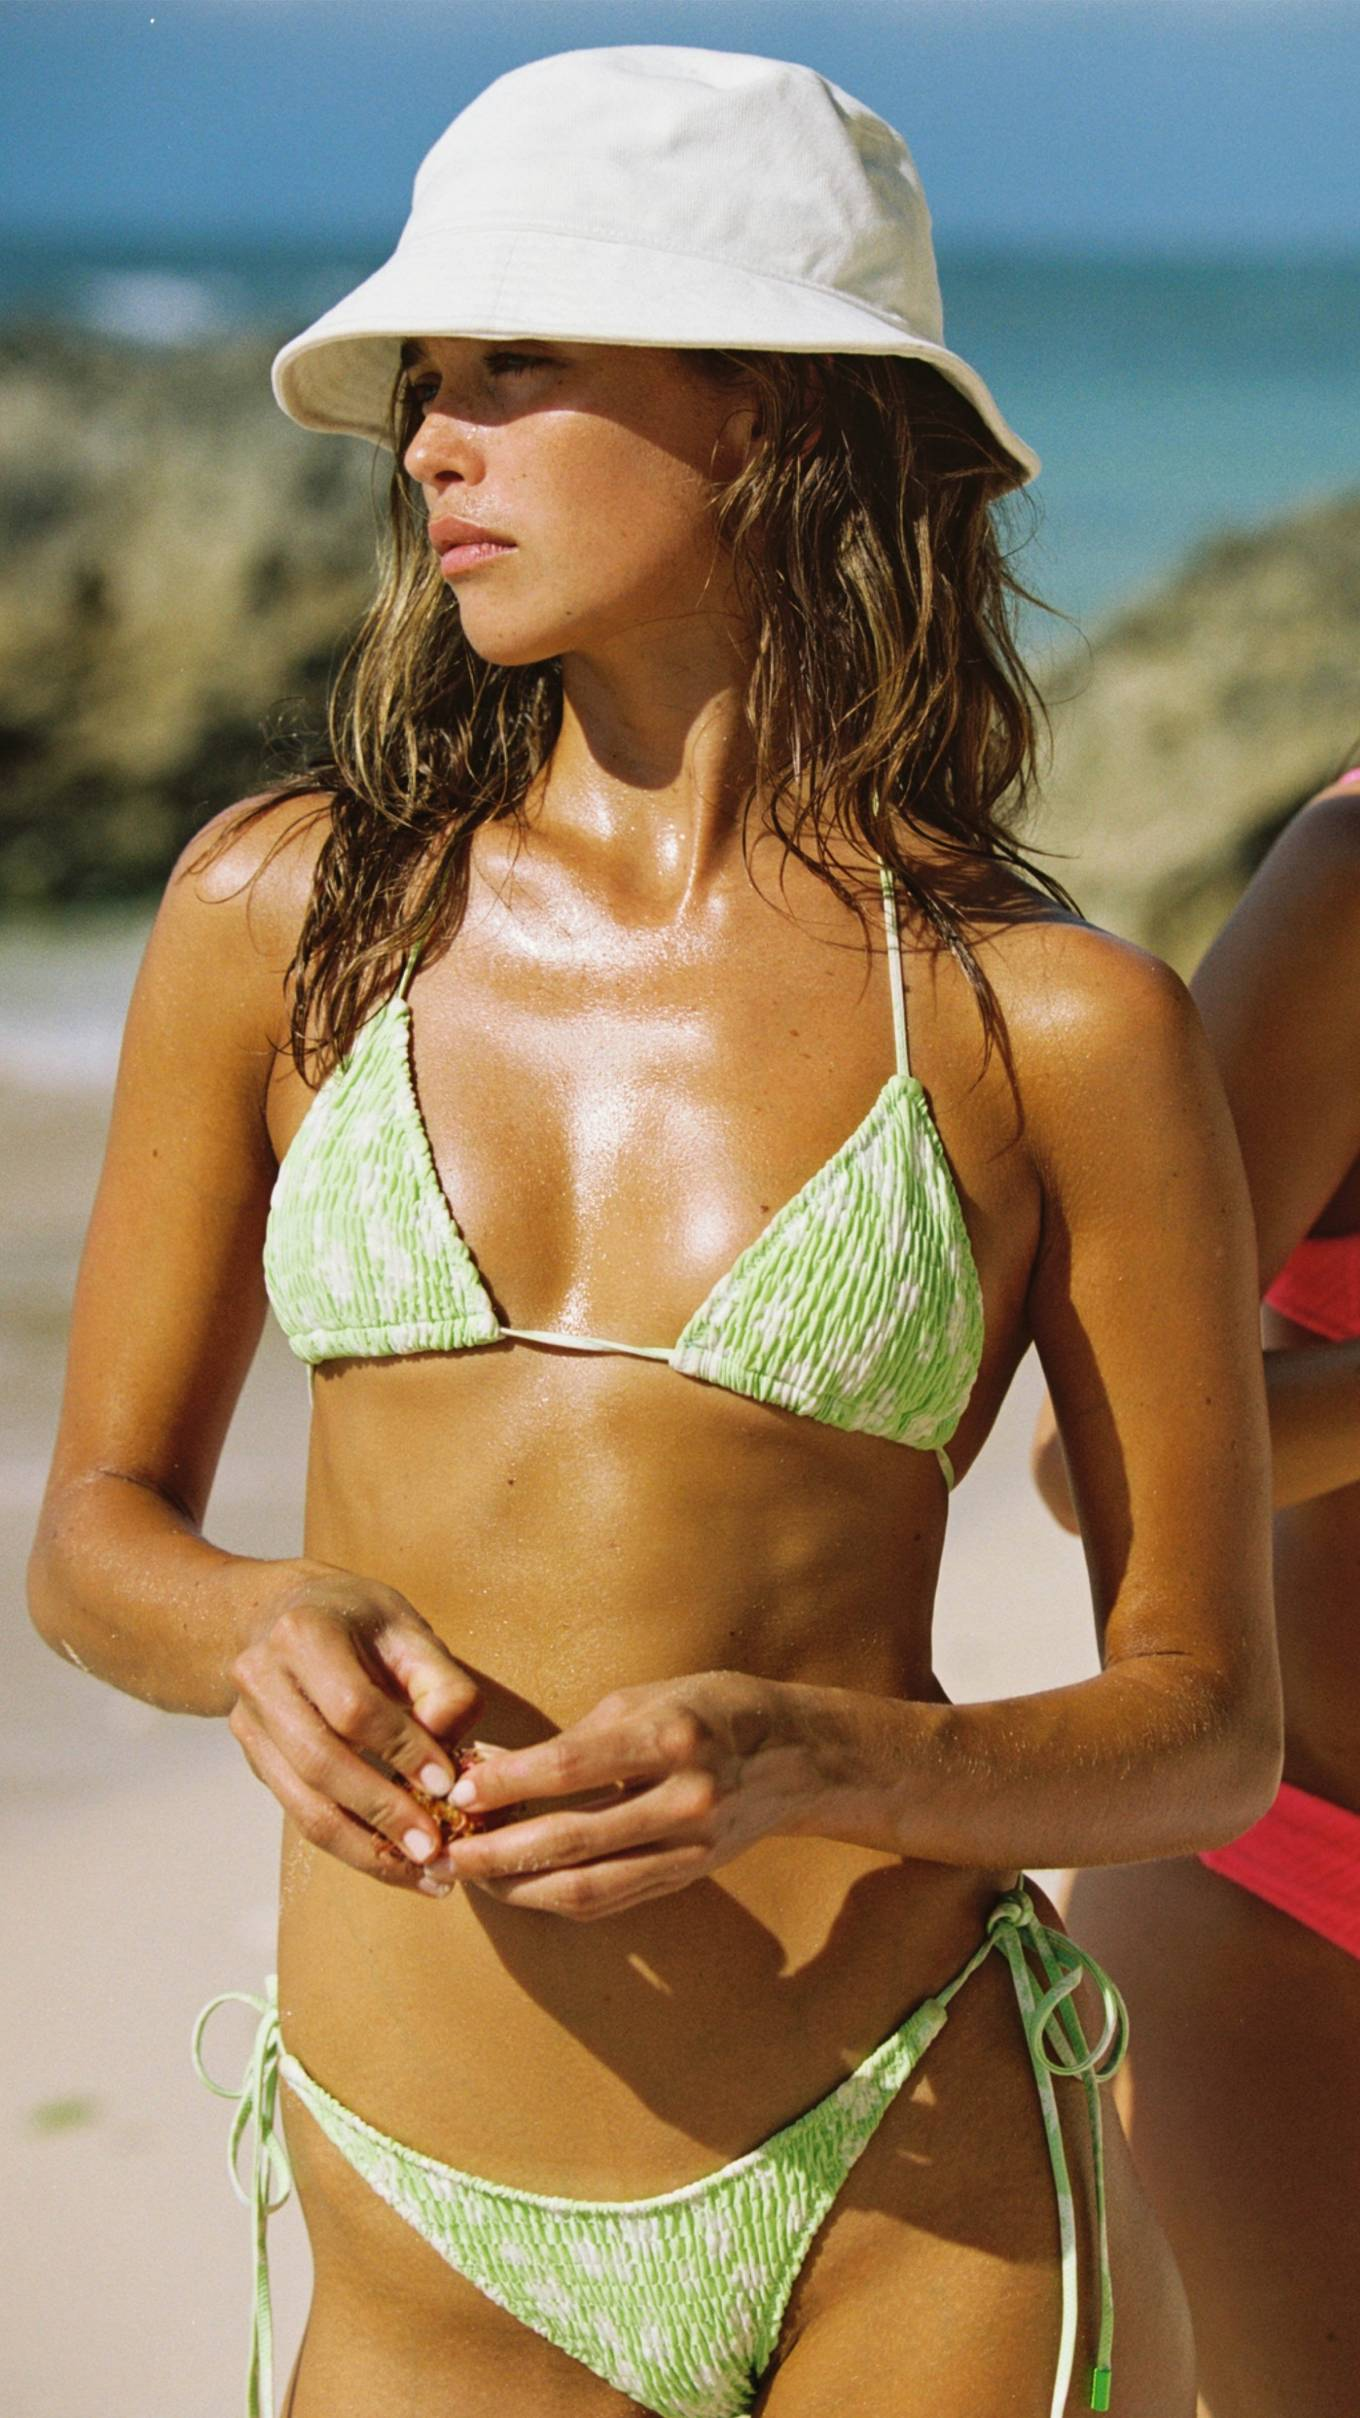 Carolina Sanchez 2020 : Carolina Sanchez – Triangl Swimwear 2020-08